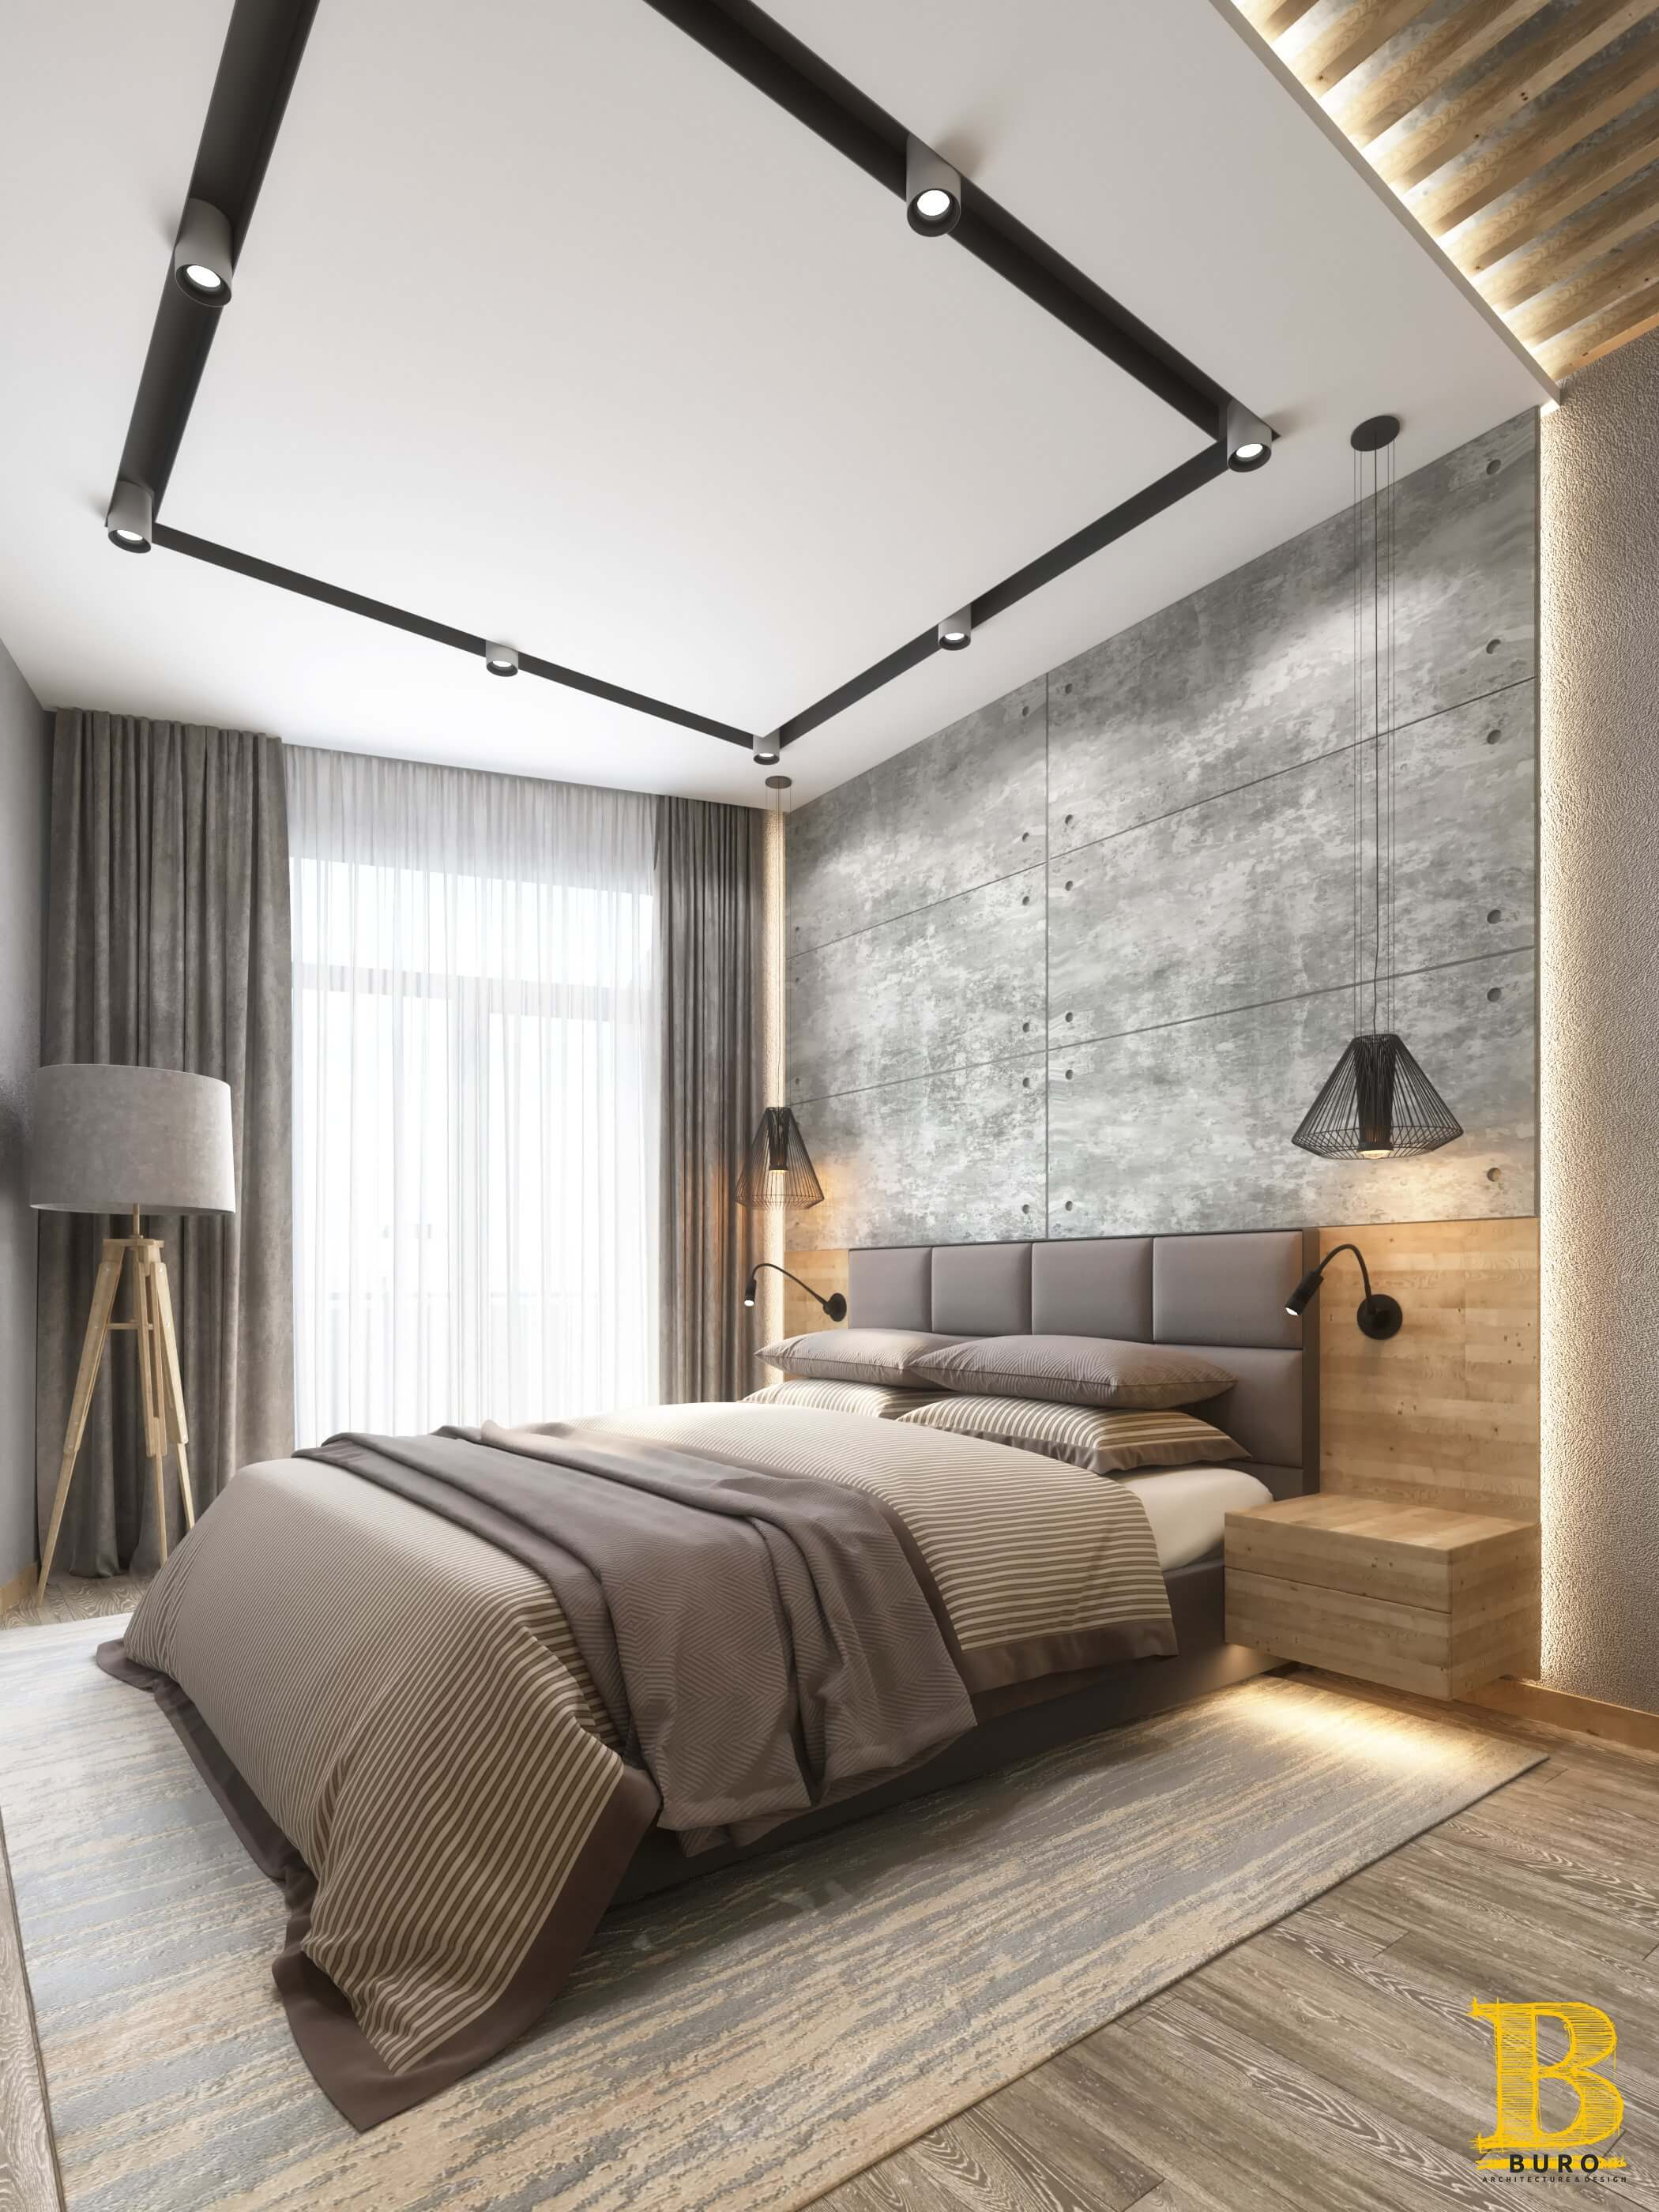 3D визуализация дизайна спальни в лофт стиле ЖК Миконос Одесса